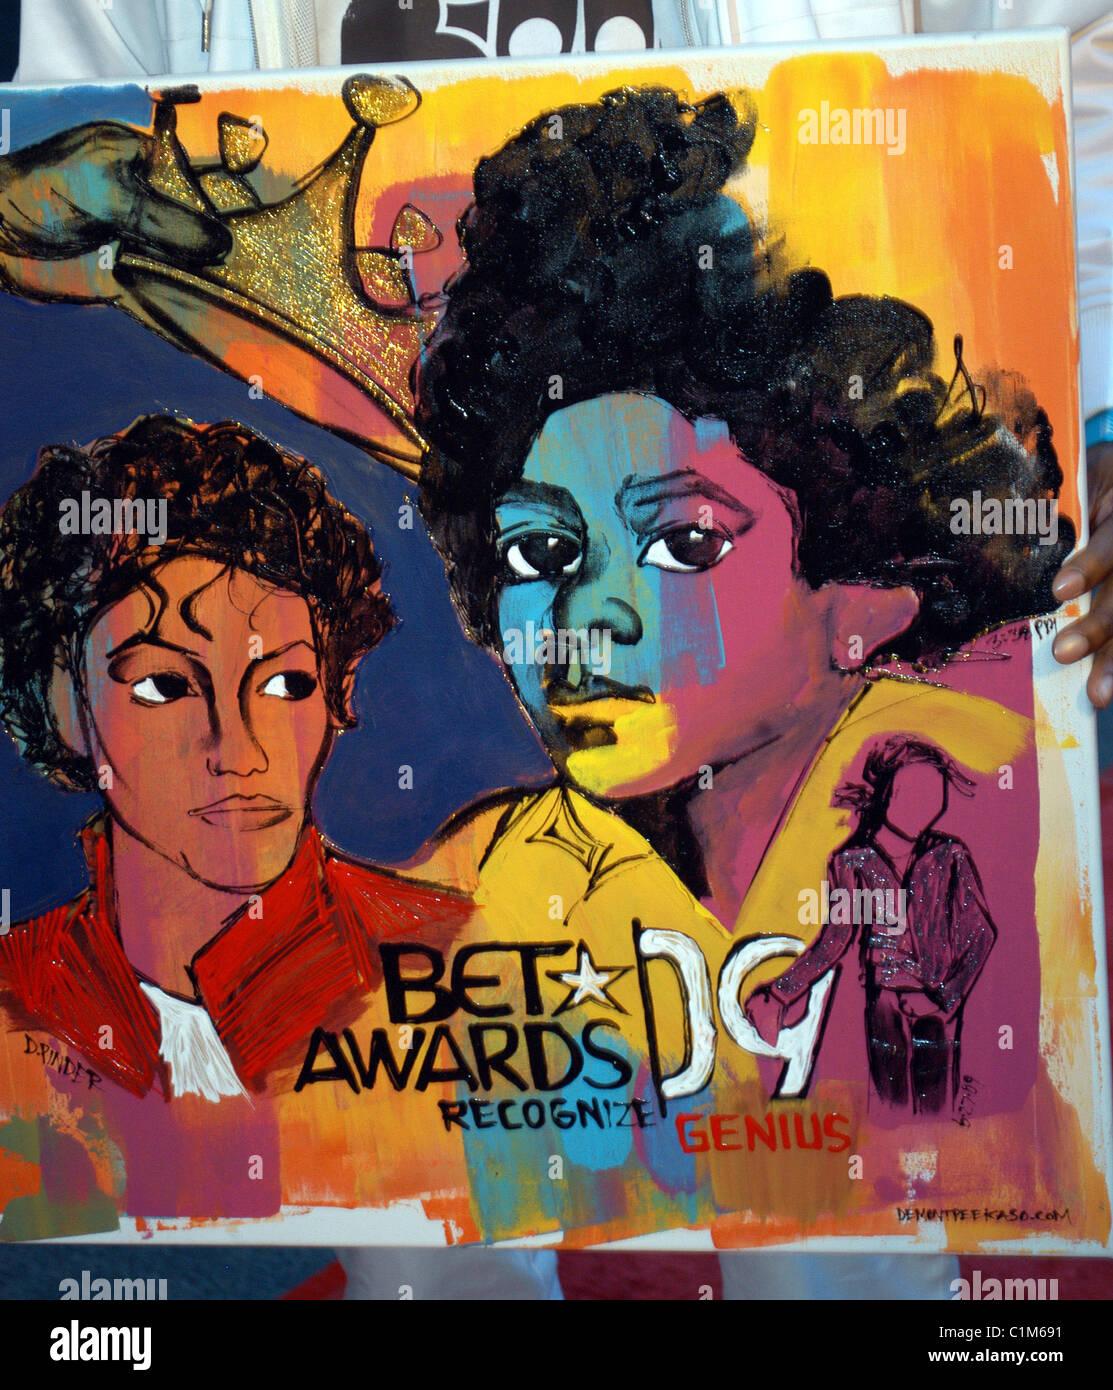 Michael Jackson Art Imágenes De Stock & Michael Jackson Art Fotos De ...